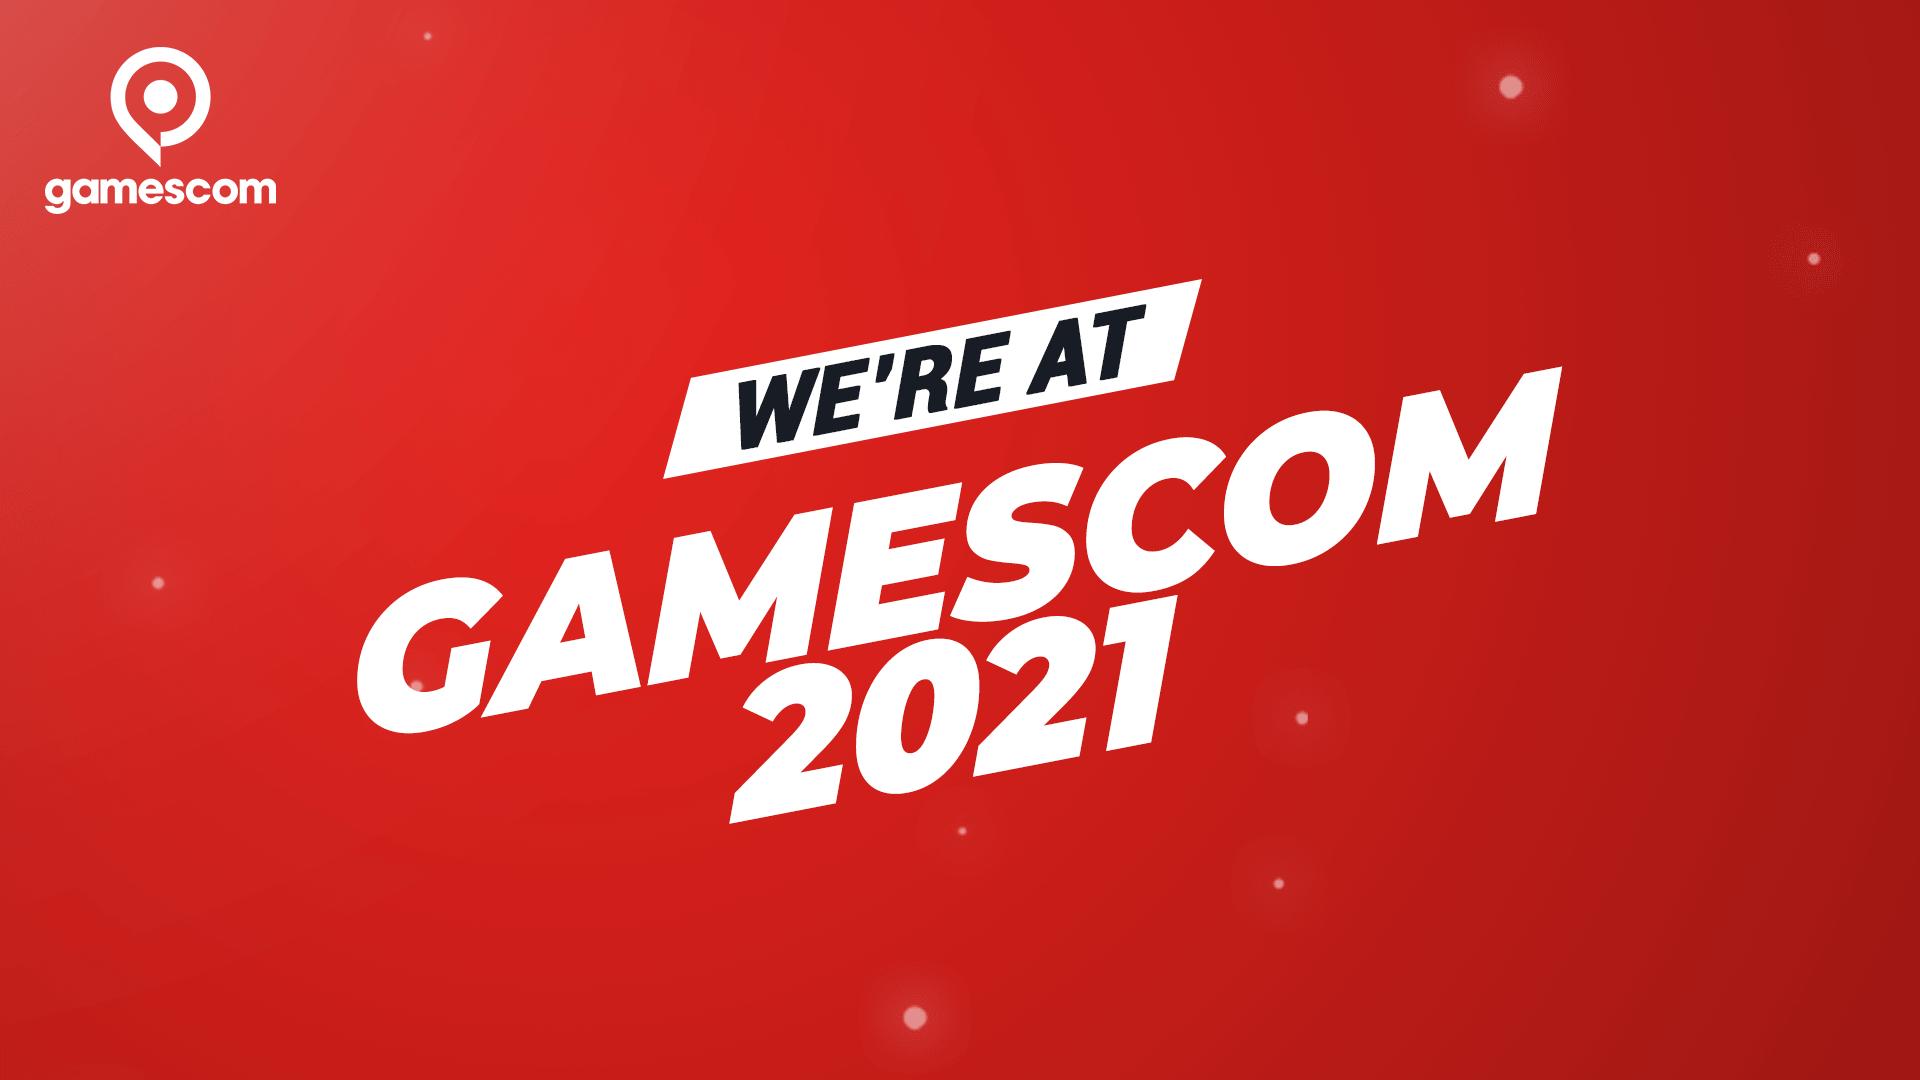 SOEDESCO® brings Monster Crown, Saint Kotar and Real Farm to Gamescom 2021